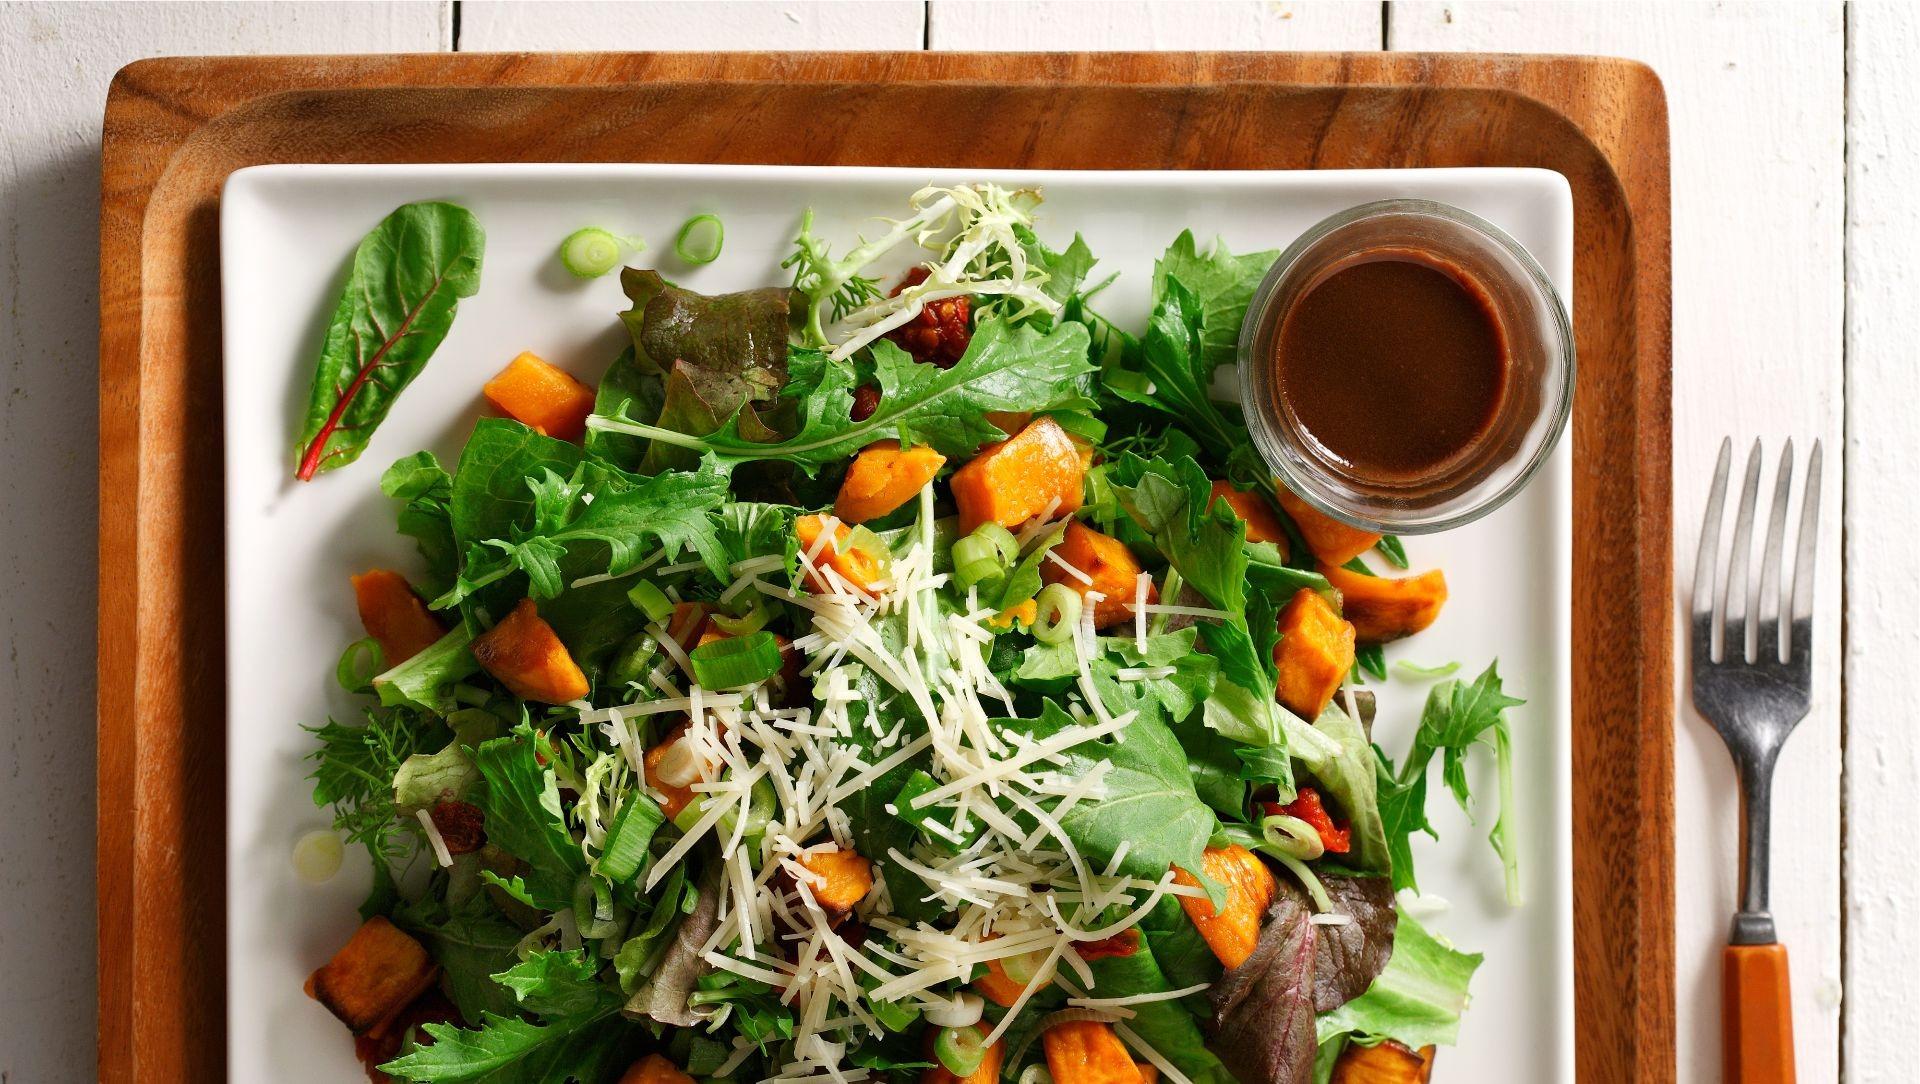 Warm sweet potato, sundried tomato and arugula salad on a white square plate.